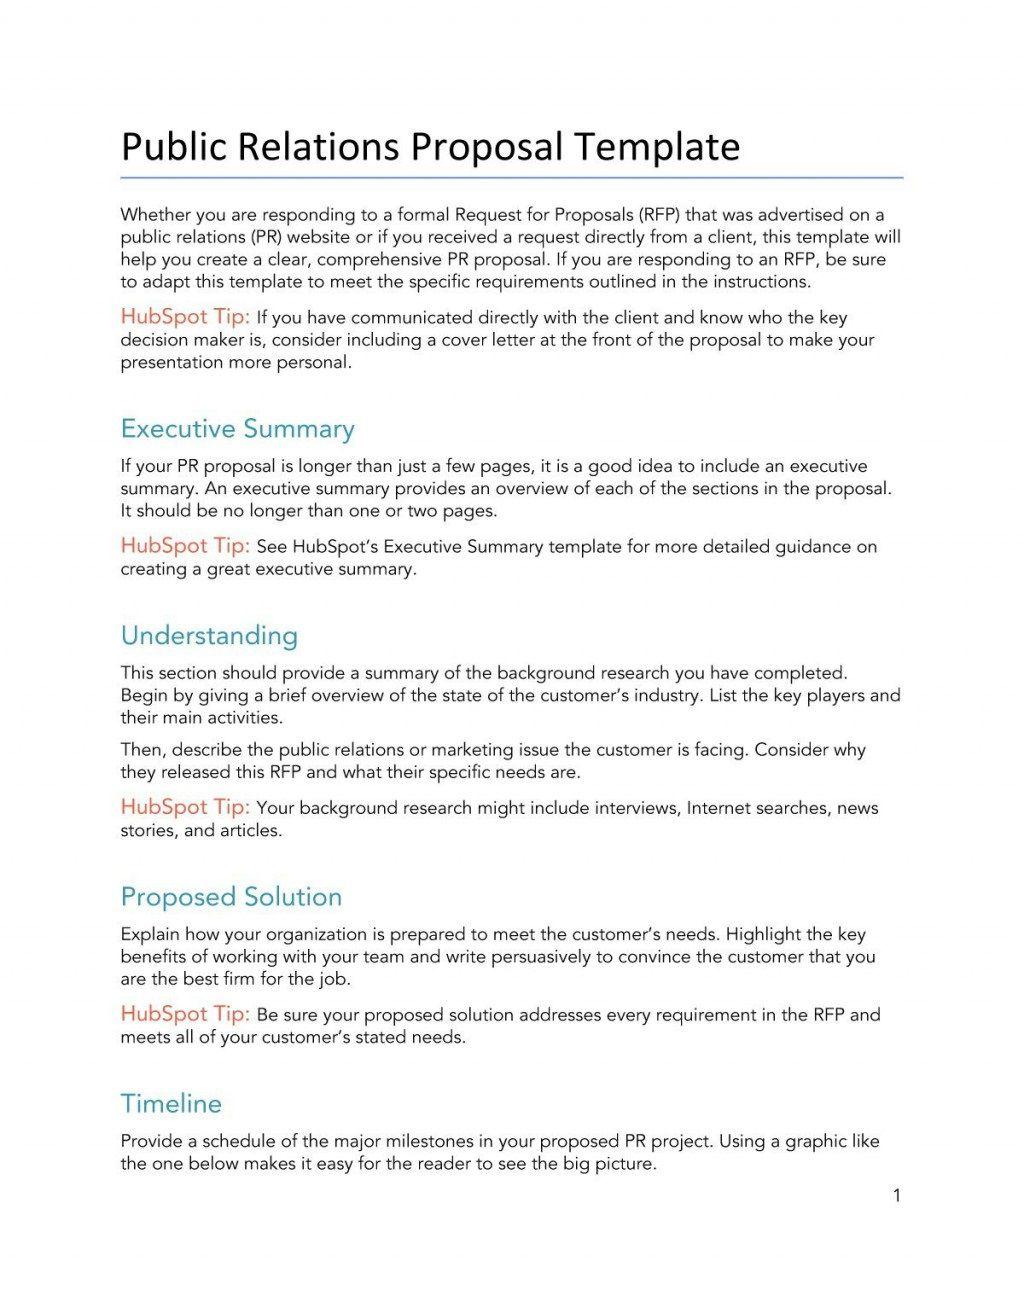 001 Amazing Public Relation Strategy Plan Template Image  ExampleFull